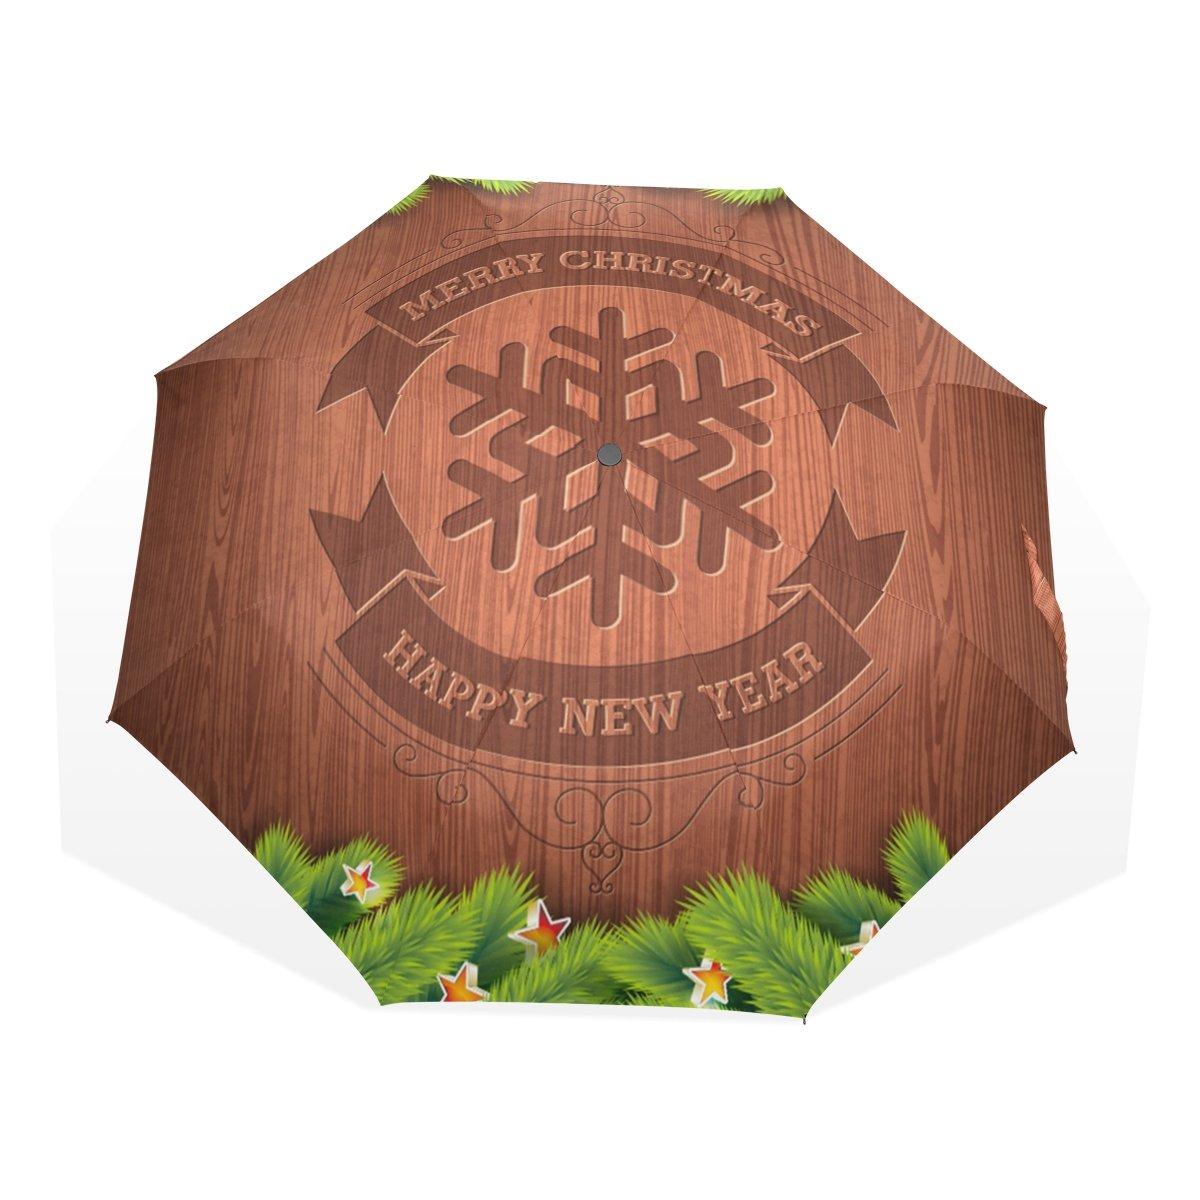 leisisi Merry Christmas Personalizedファッション傘防風折りたたみトラベルコンパクト傘 B078C7TWPRXHS-05